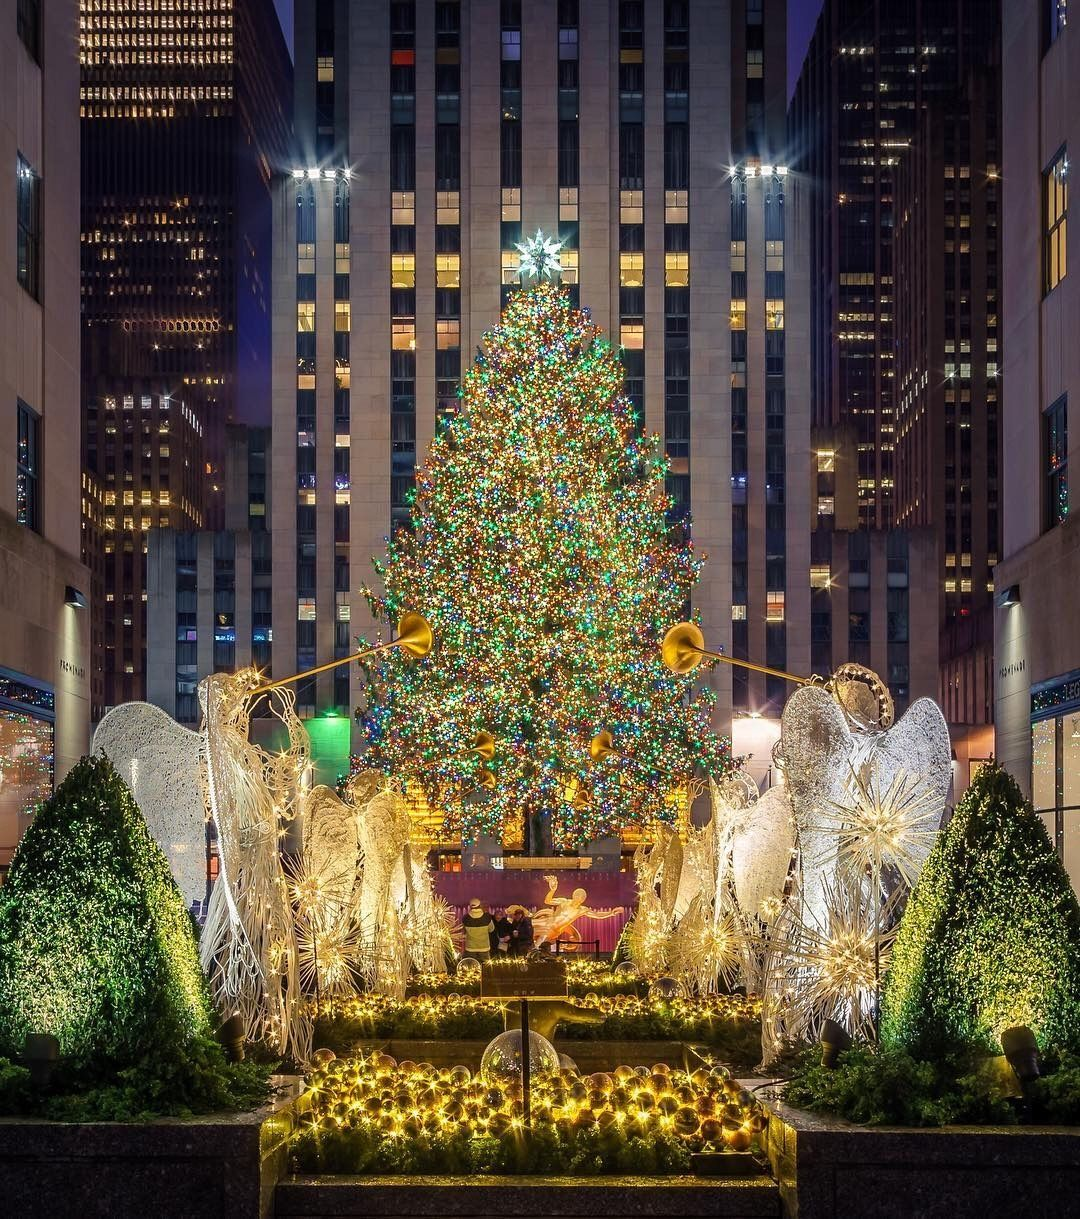 Rockefeller Center Christmas Tree 🎄 by @nathanmphotos - Stad, Kunst en Hoeden